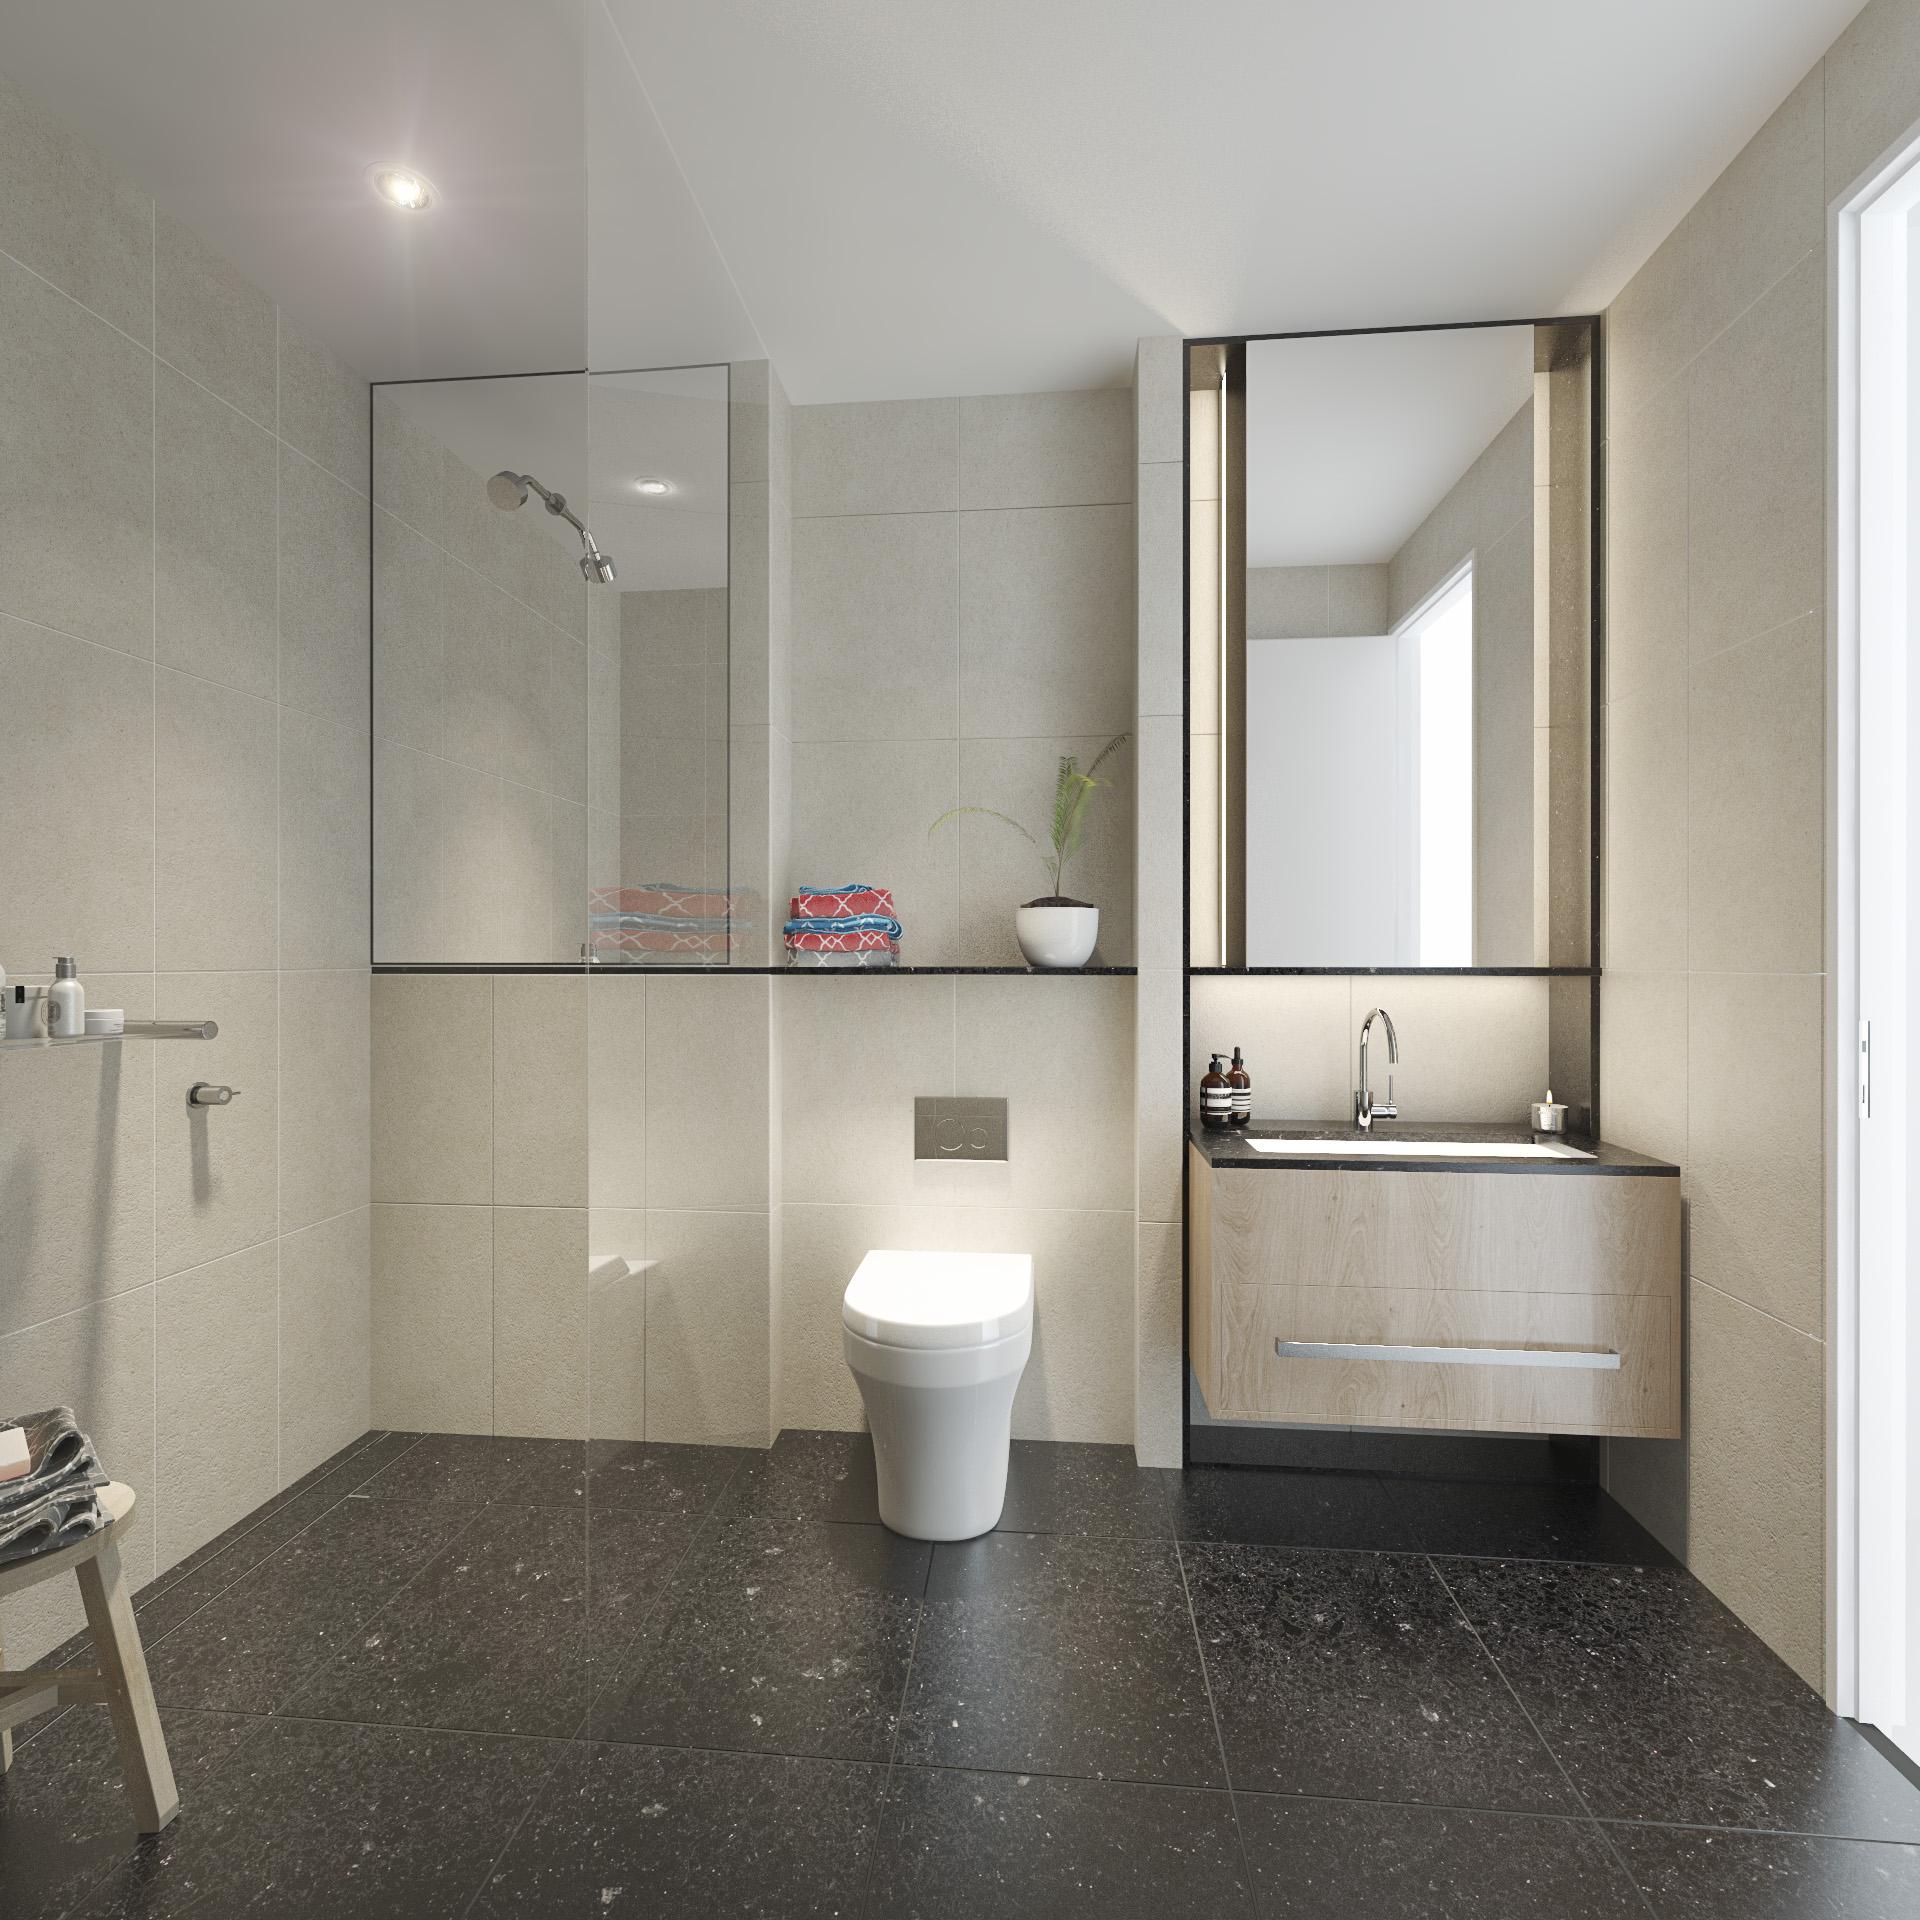 140820 - Aster - Bathroom